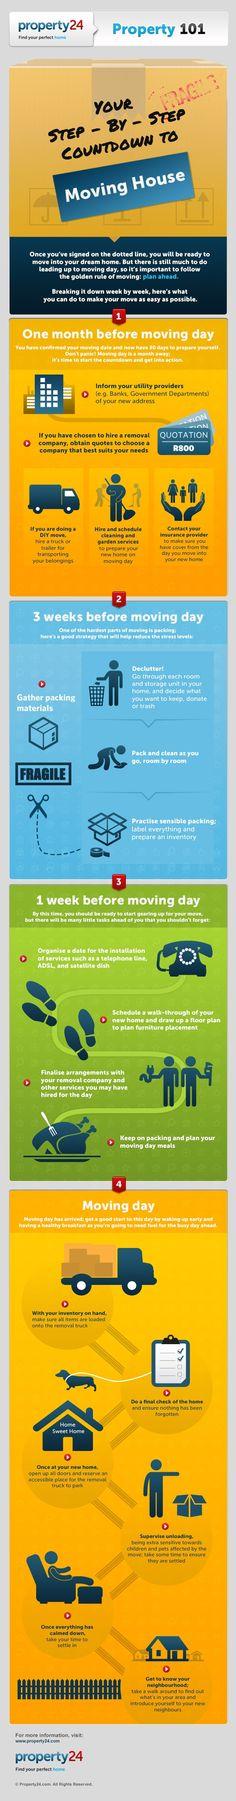 Diy moving house checklist